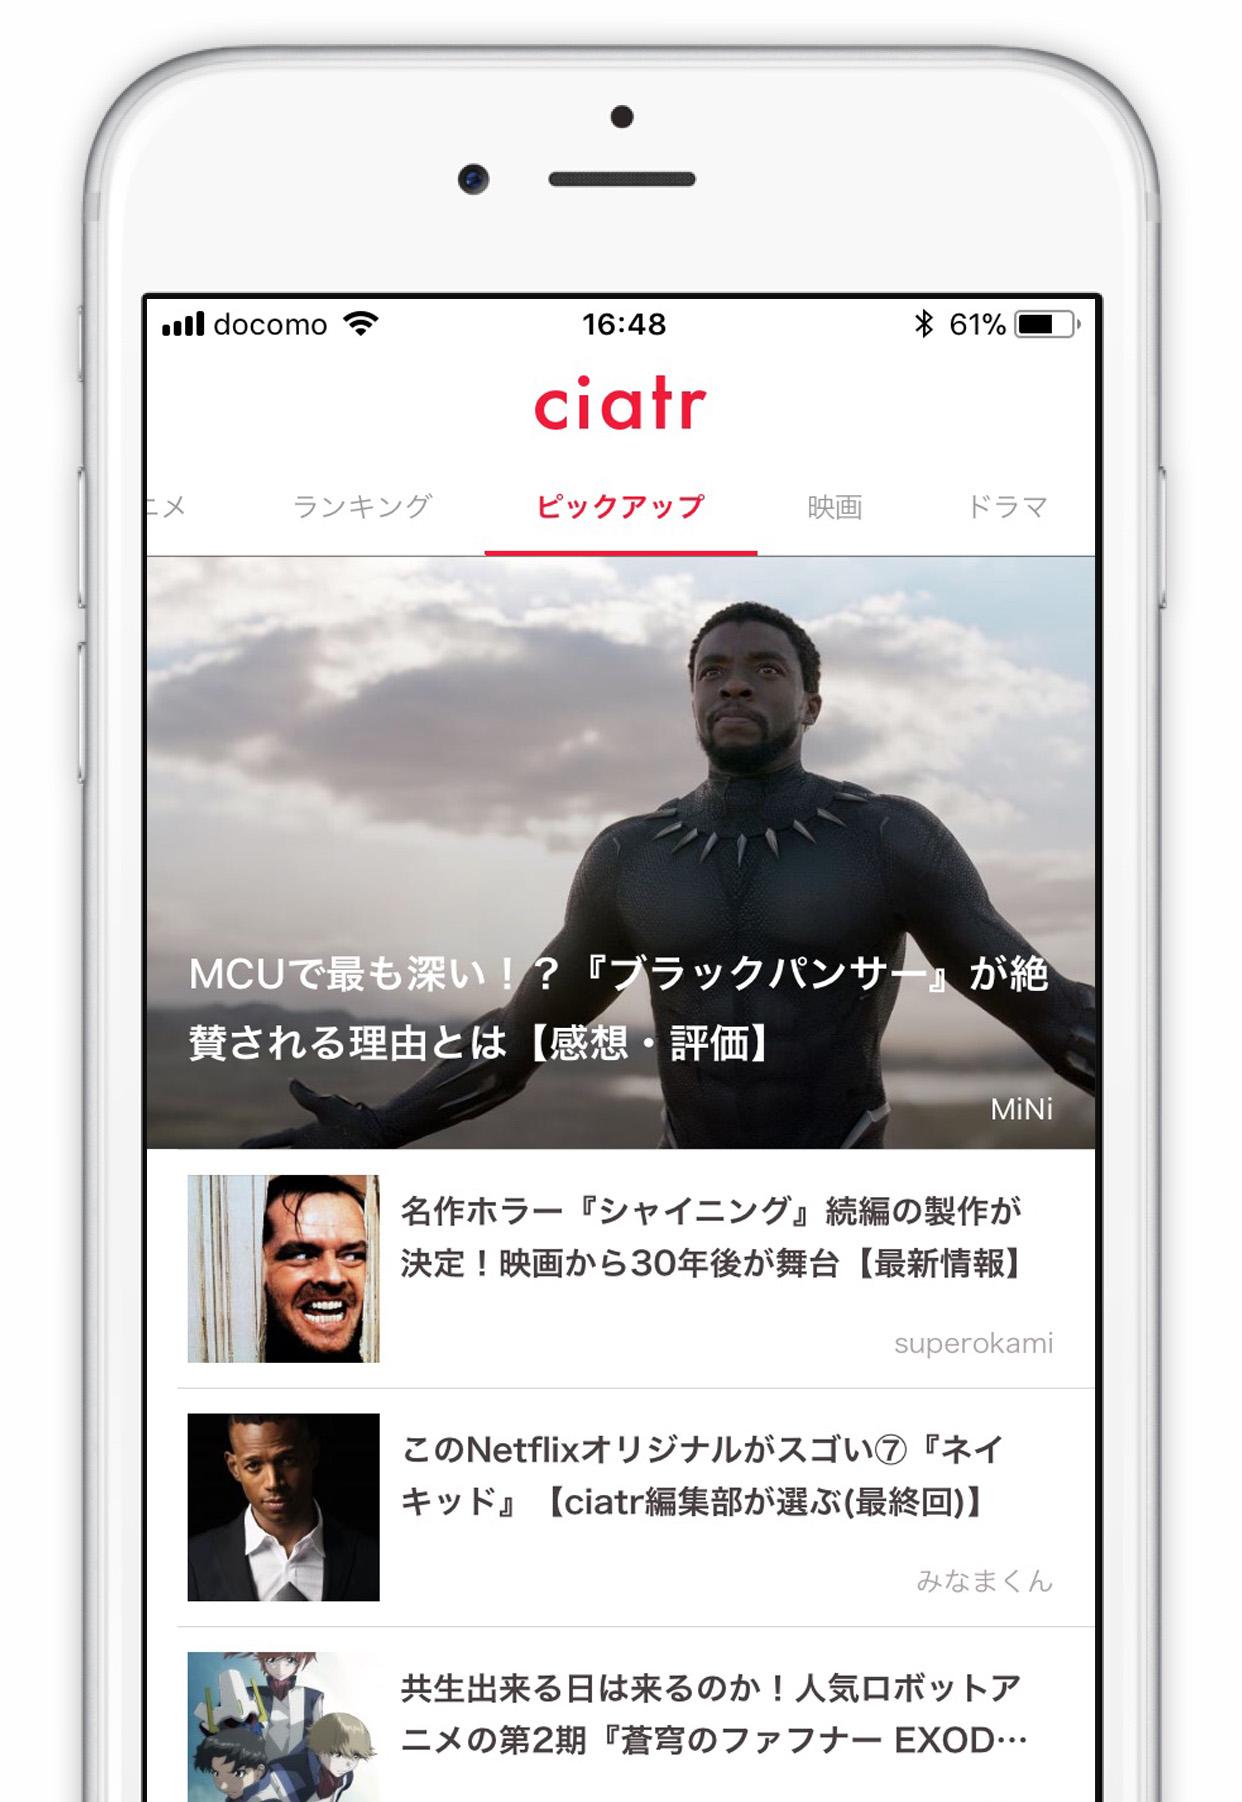 ciatr アプリ画面1